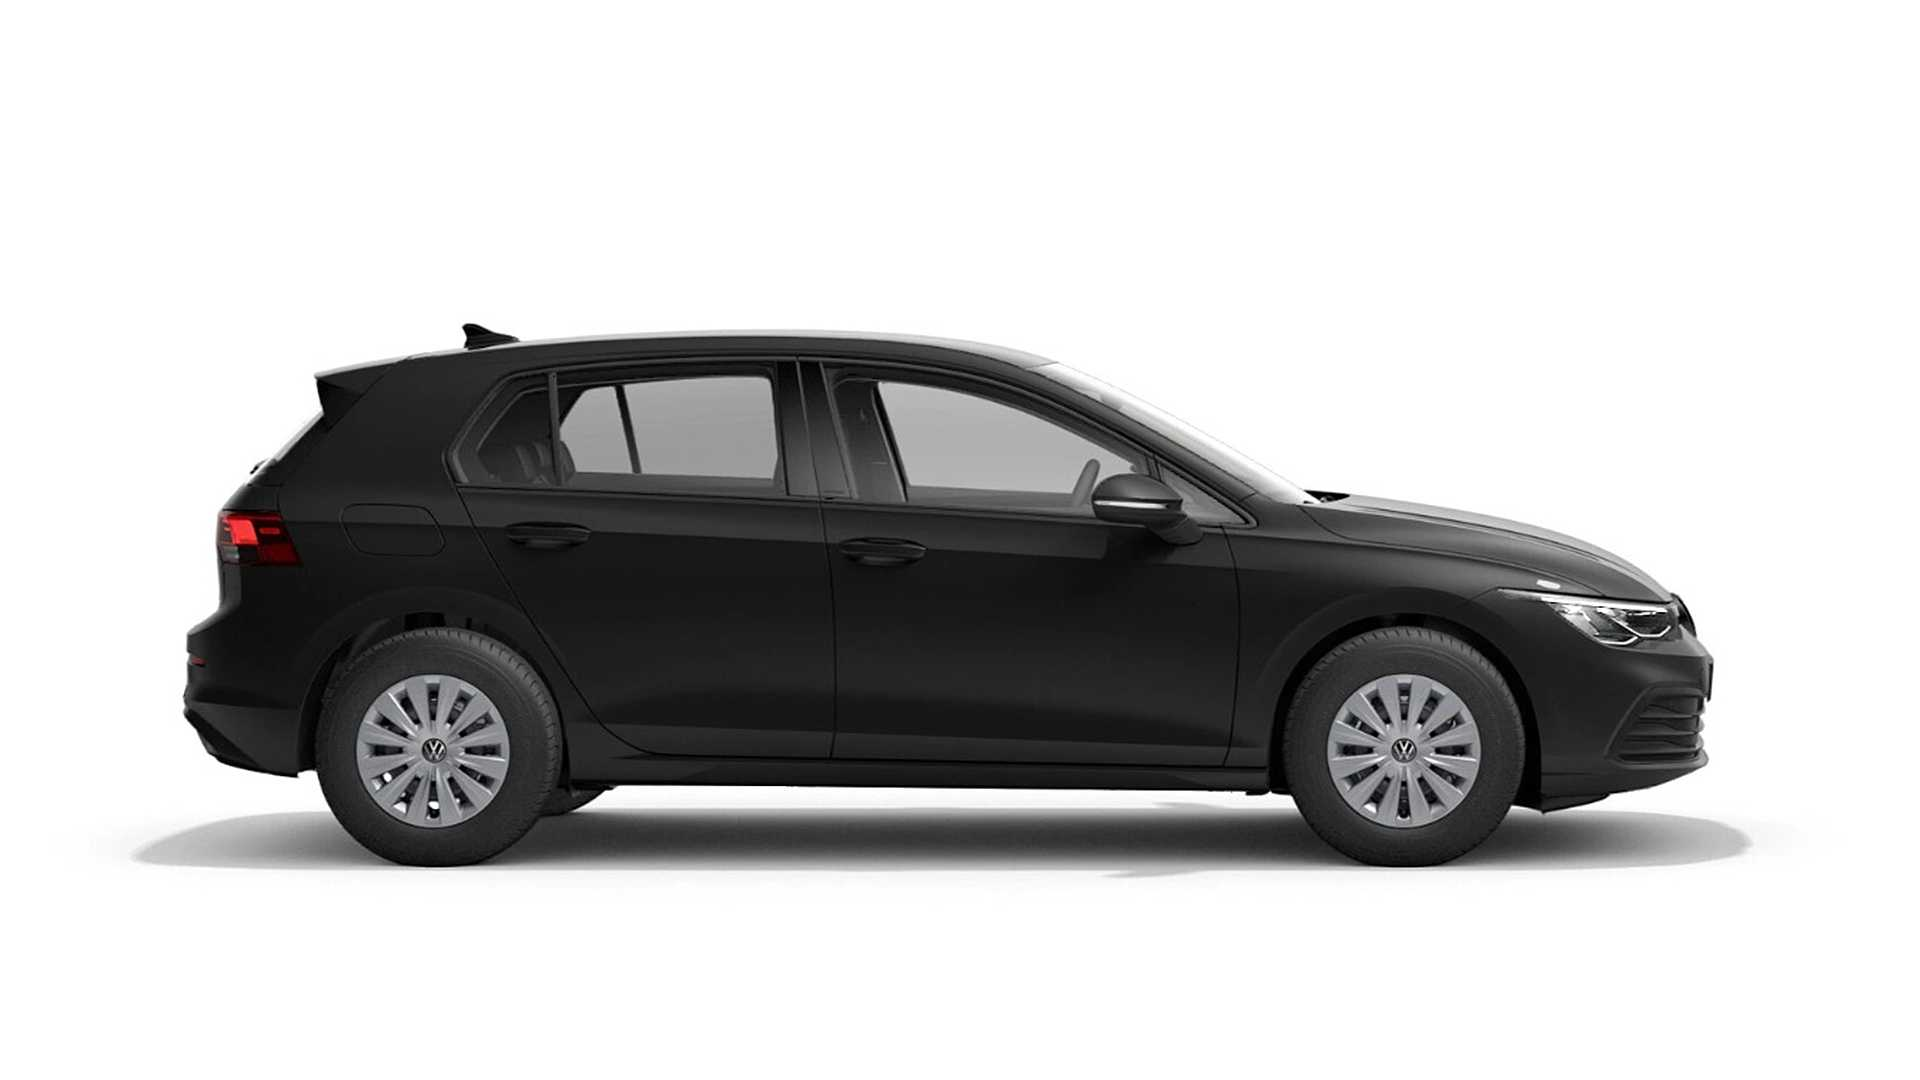 Volkswagen-Golf-2020-Base-Model-4